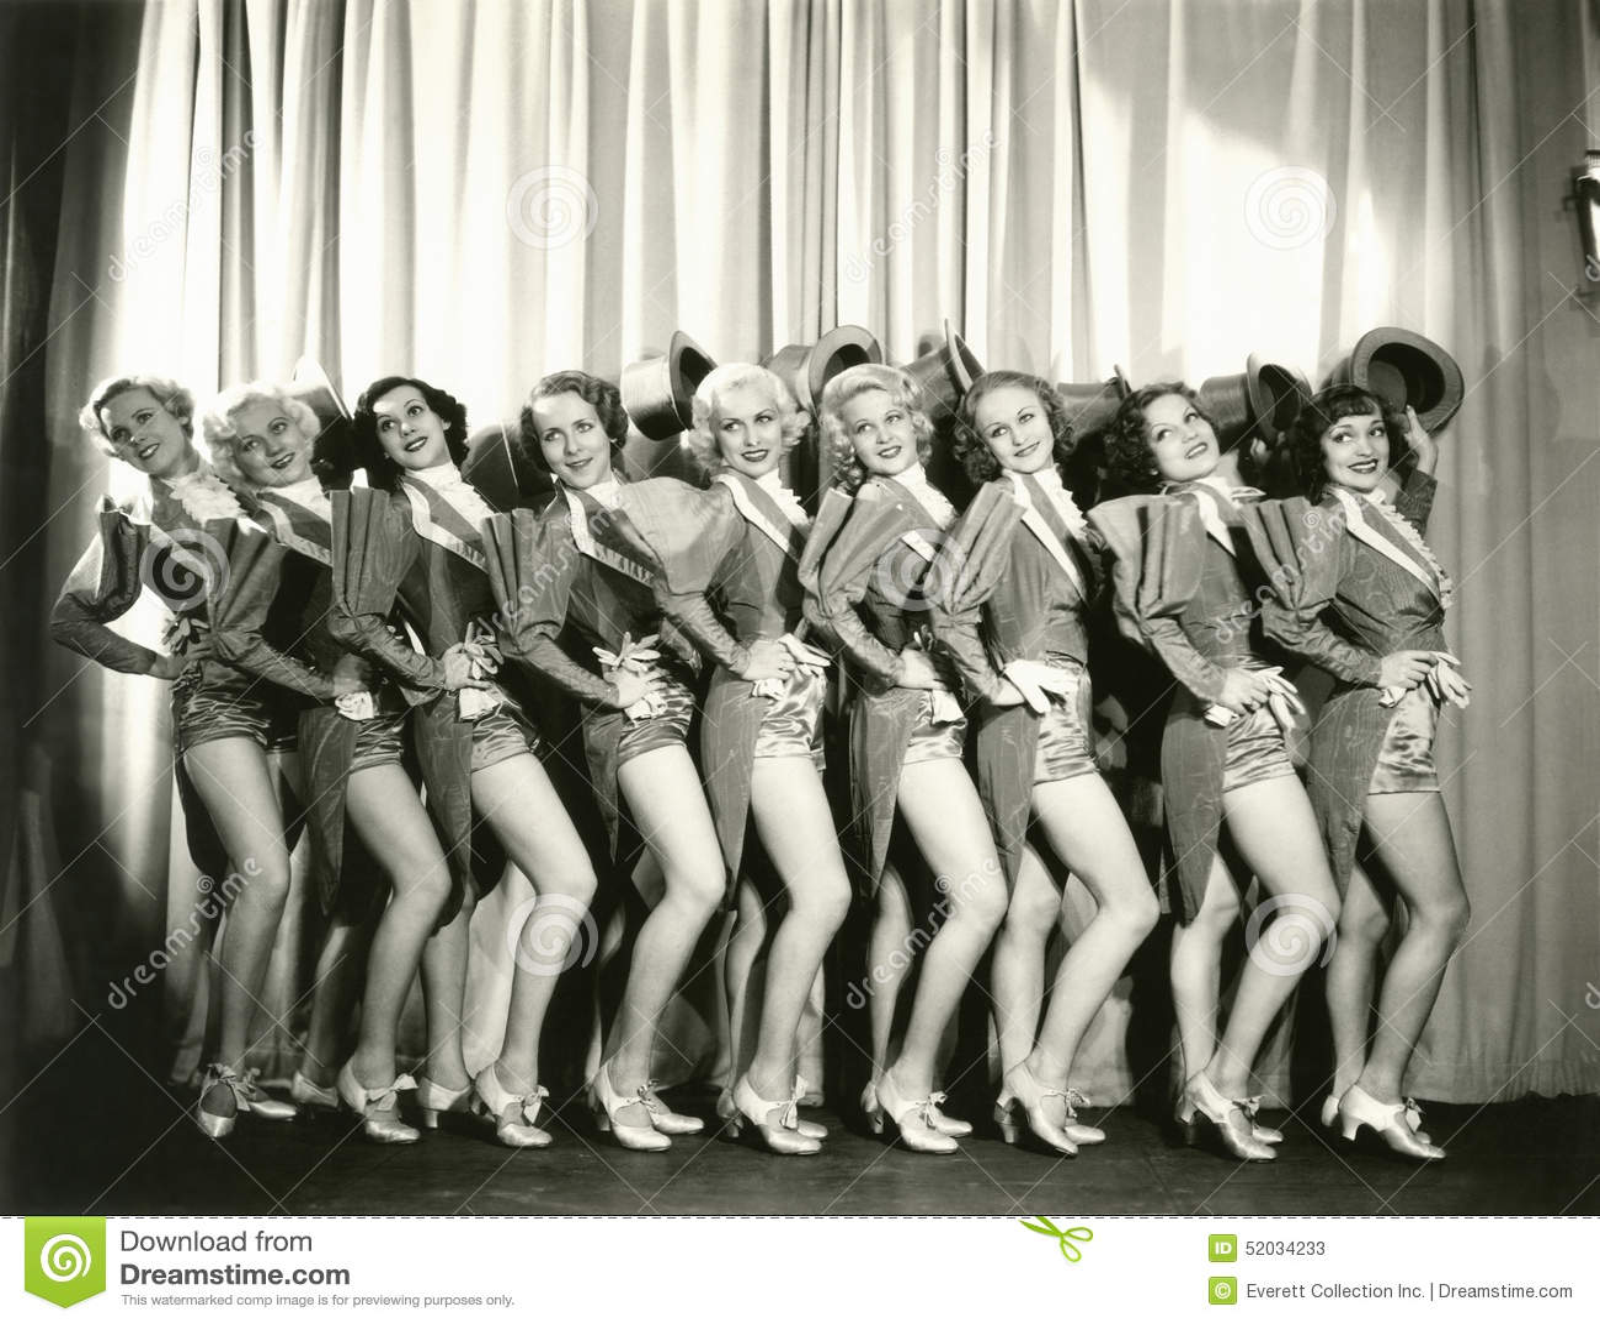 Curtain Call Stock Image. Image Of 1930s, Caucasian